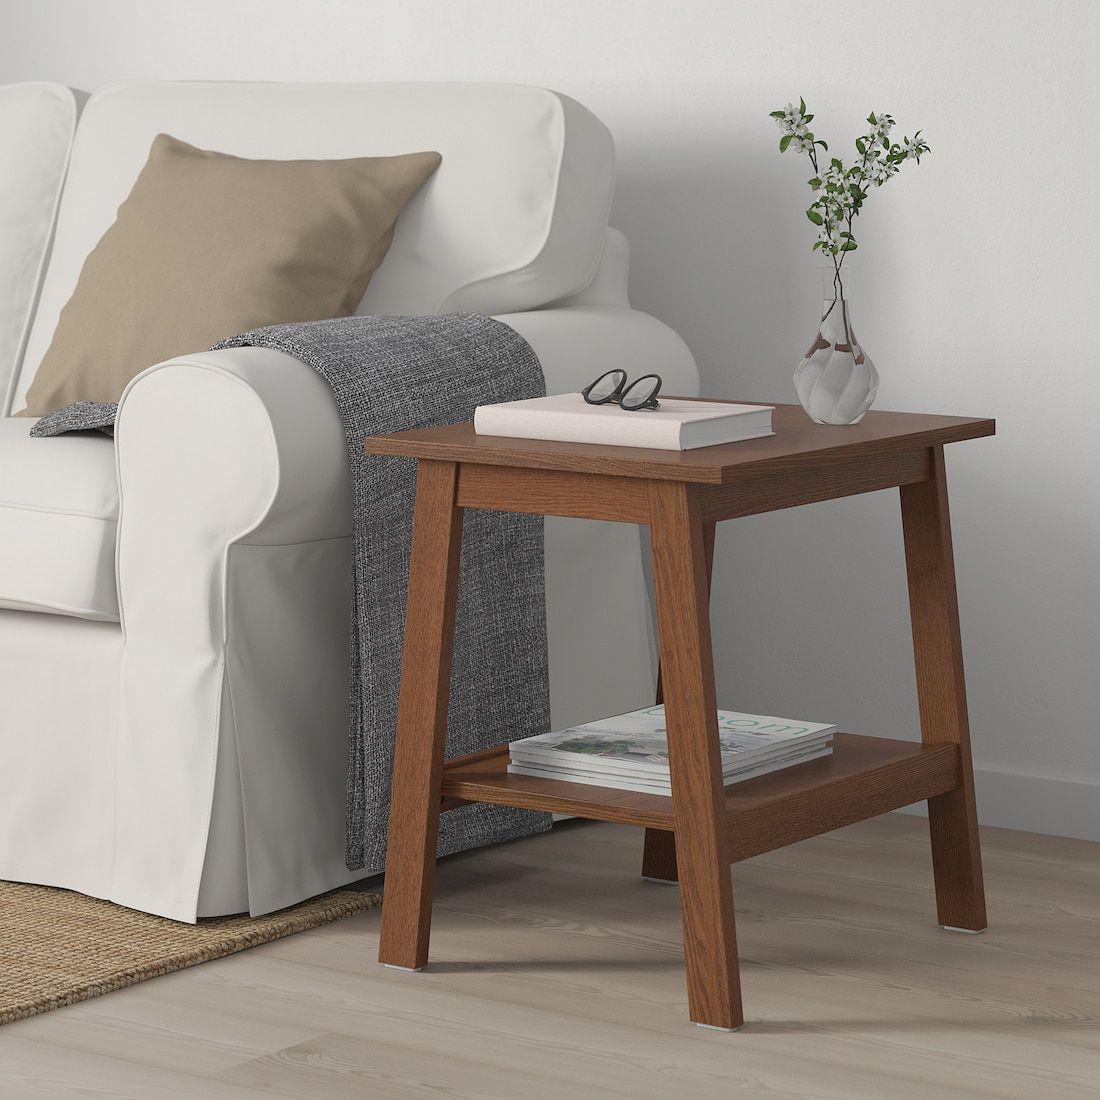 22+ White oak coffee table canada trends